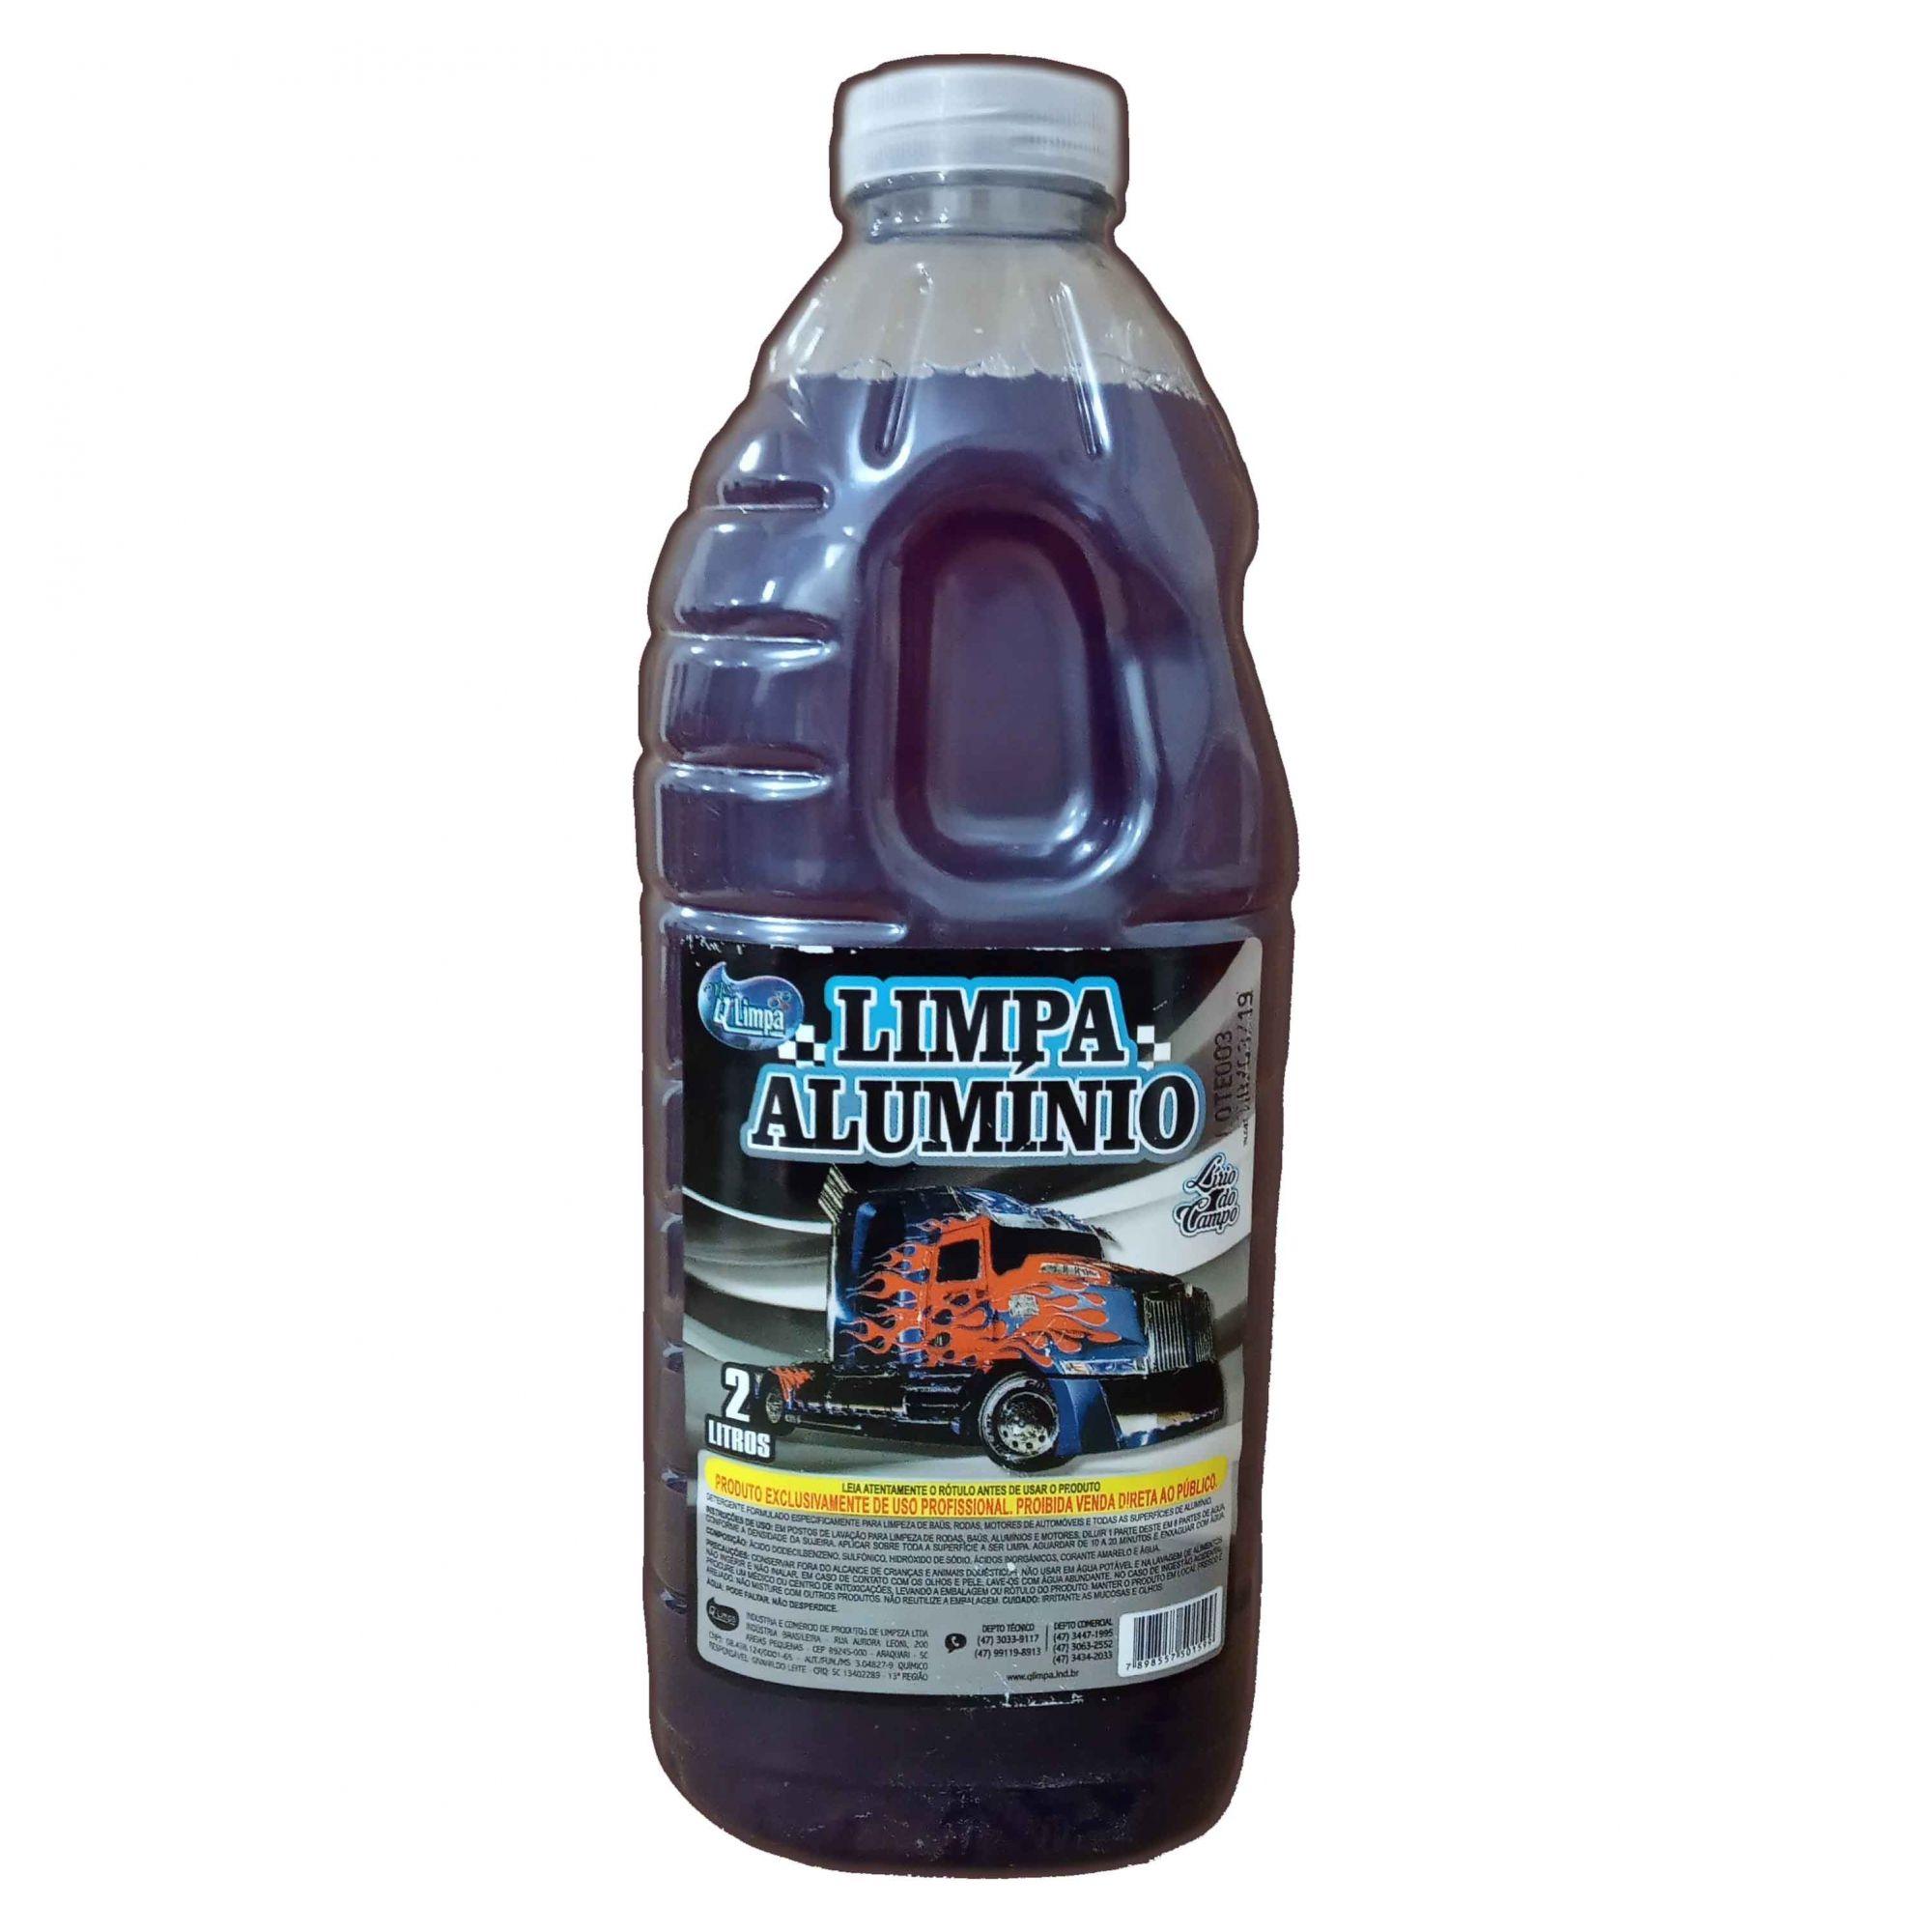 Limpa Alumínio Automotívo, Limpeza Pesada 2 Lts